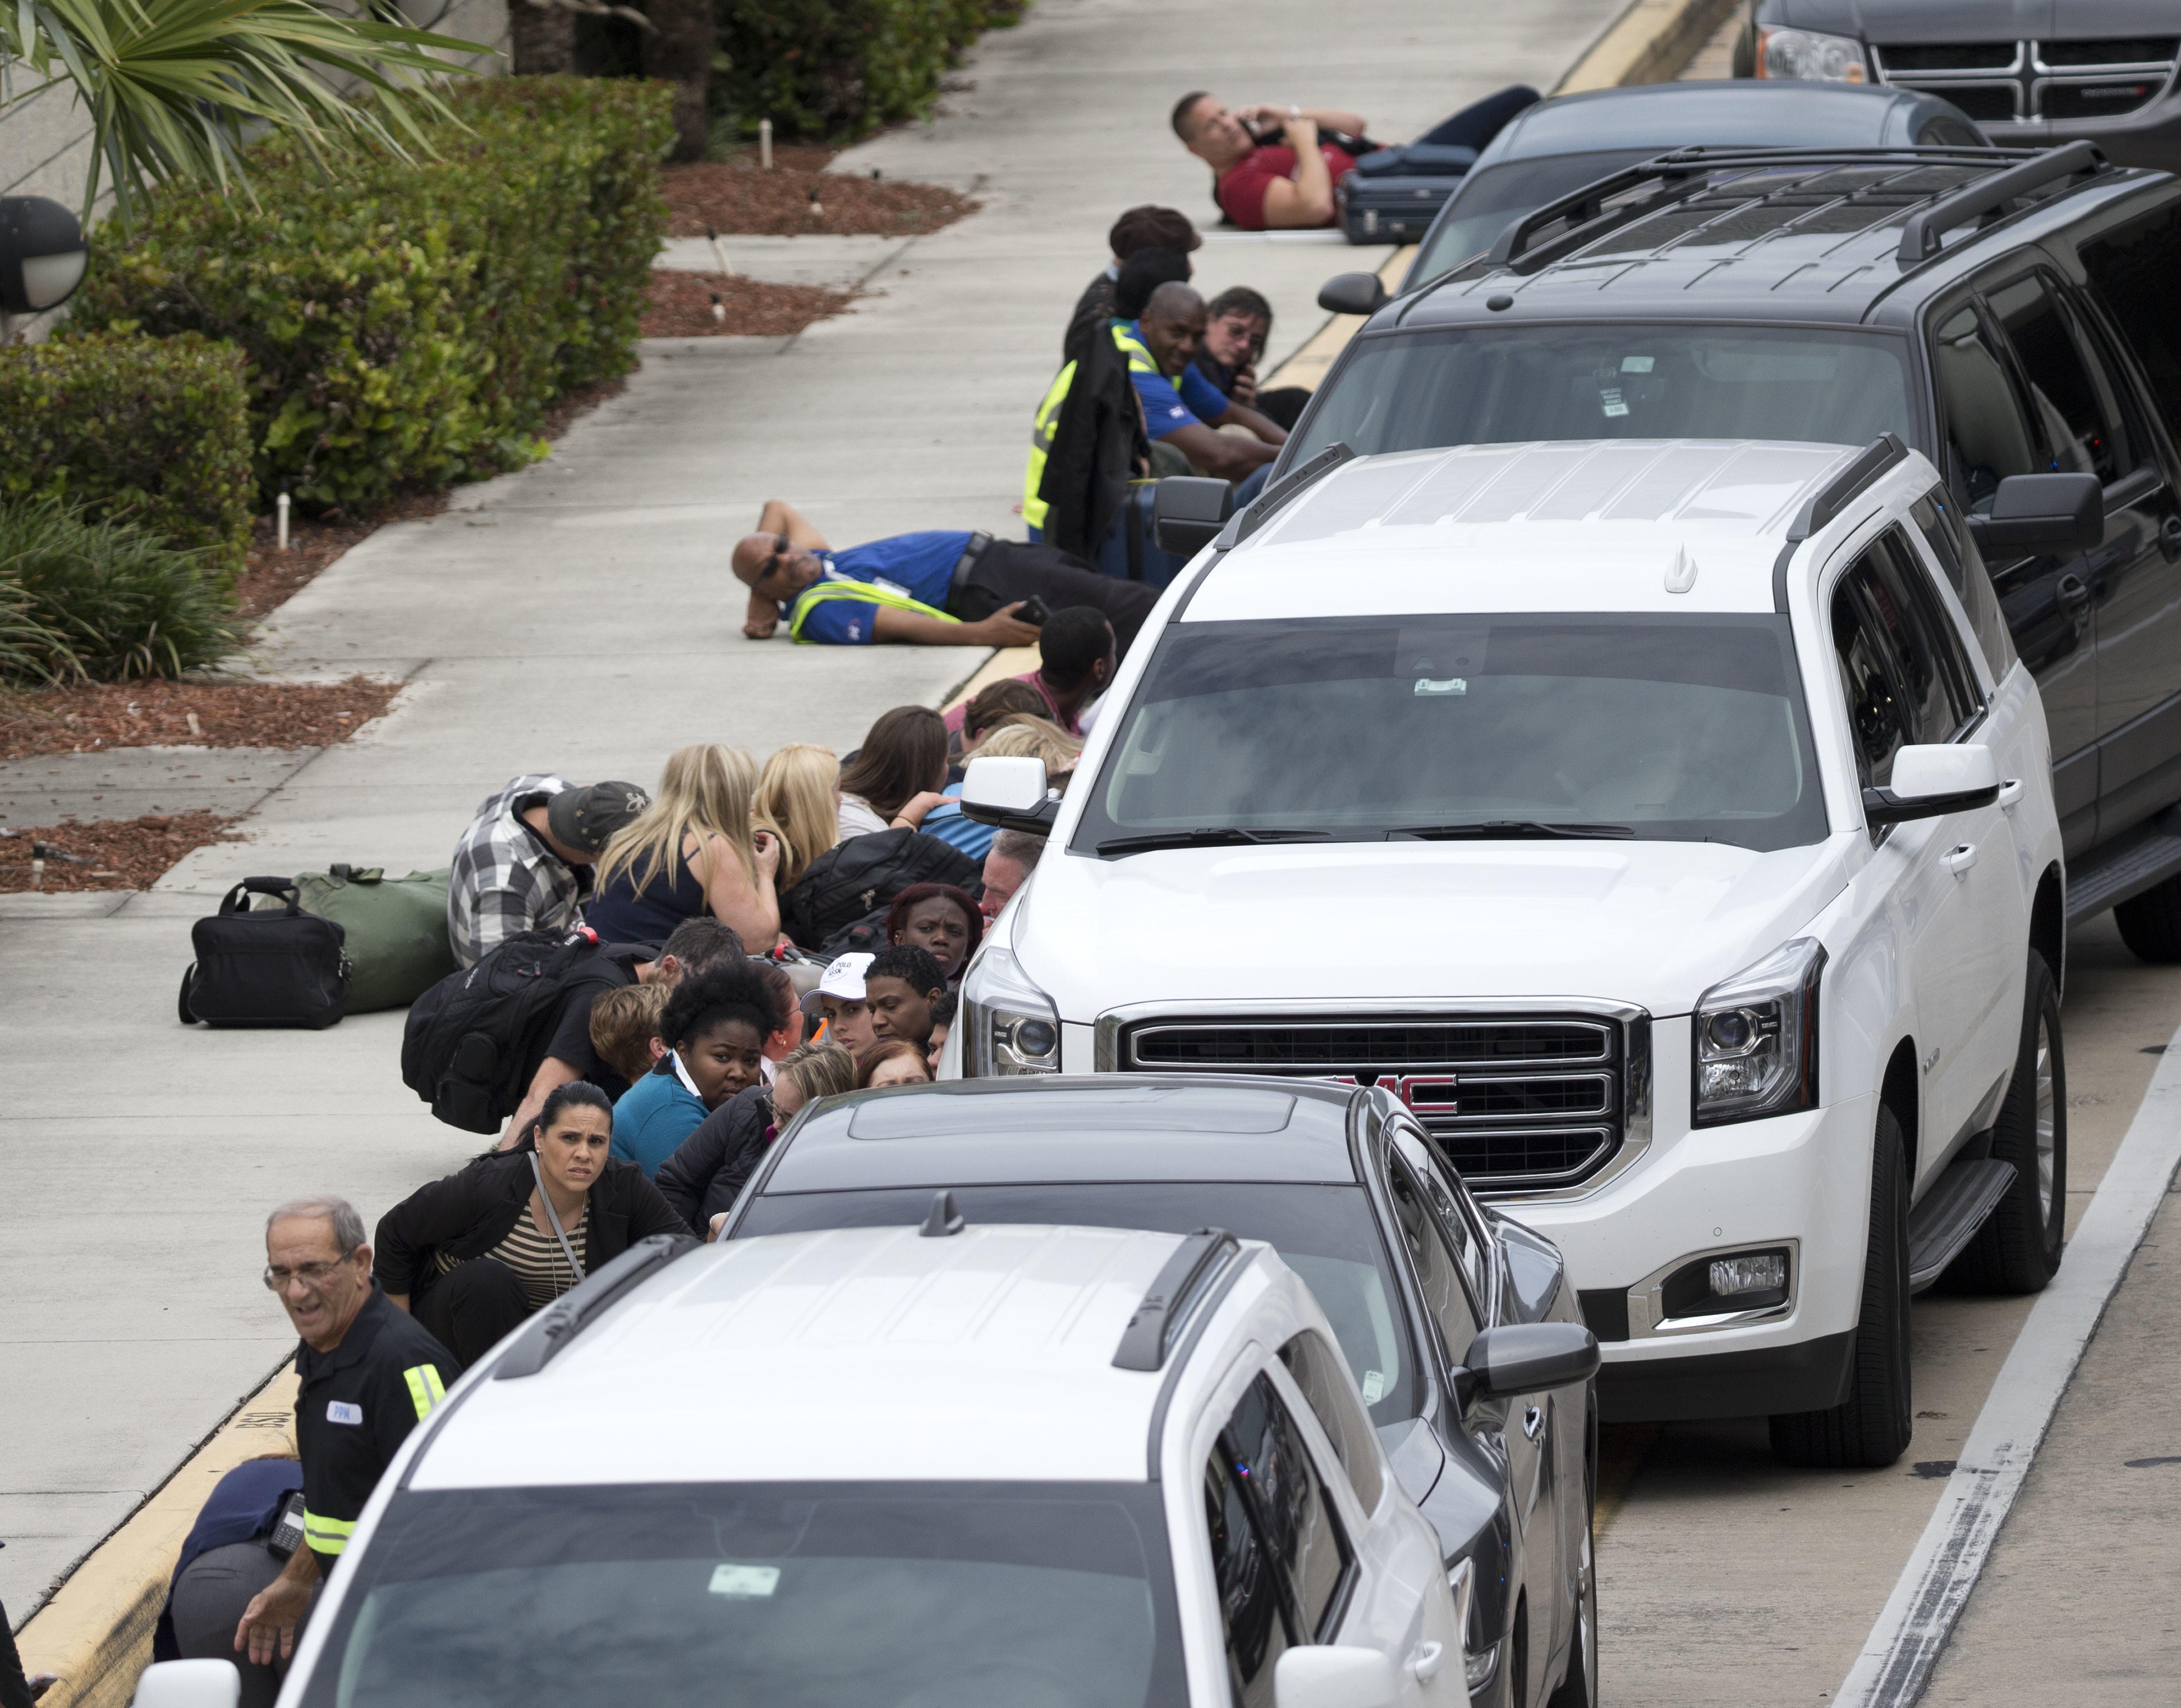 People take cover outside Fort Lauderdale–Hollywood International Airport in Fort Lauderdale, Fla., on Jan. 6, 2017. (AP Photo/Wilfredo Lee)